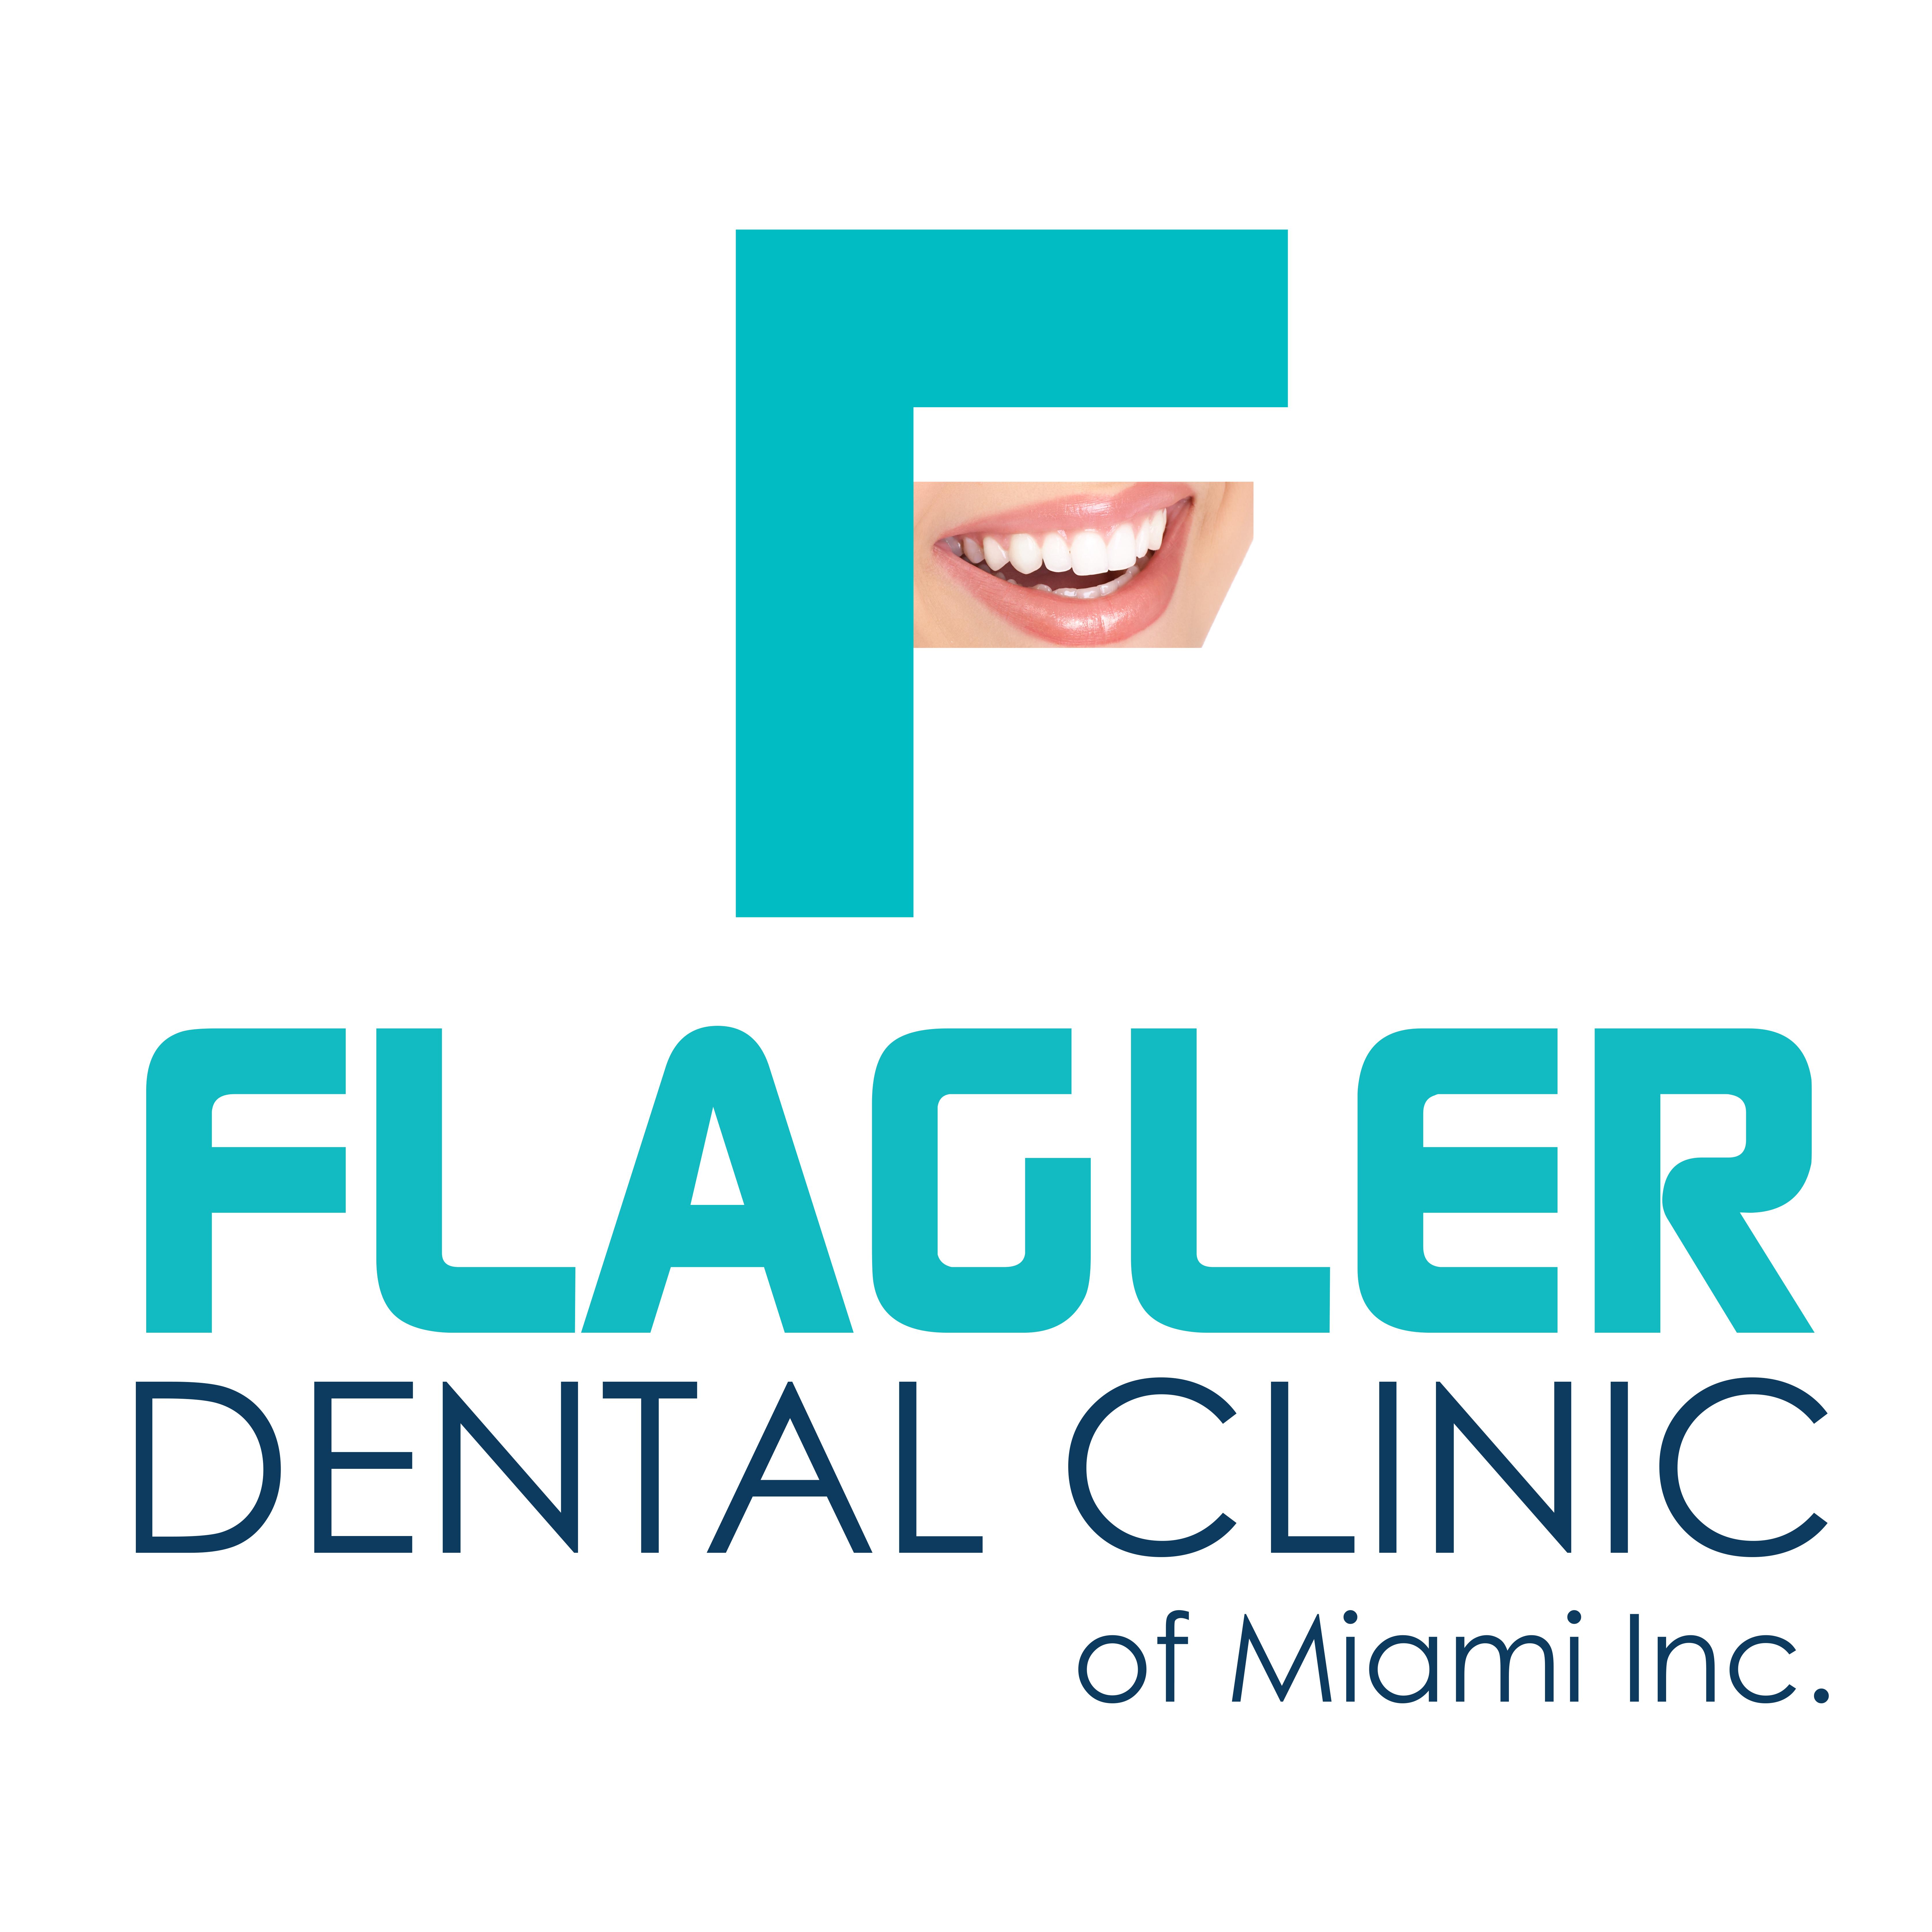 Flagler Dental Clinic of Miami Inc